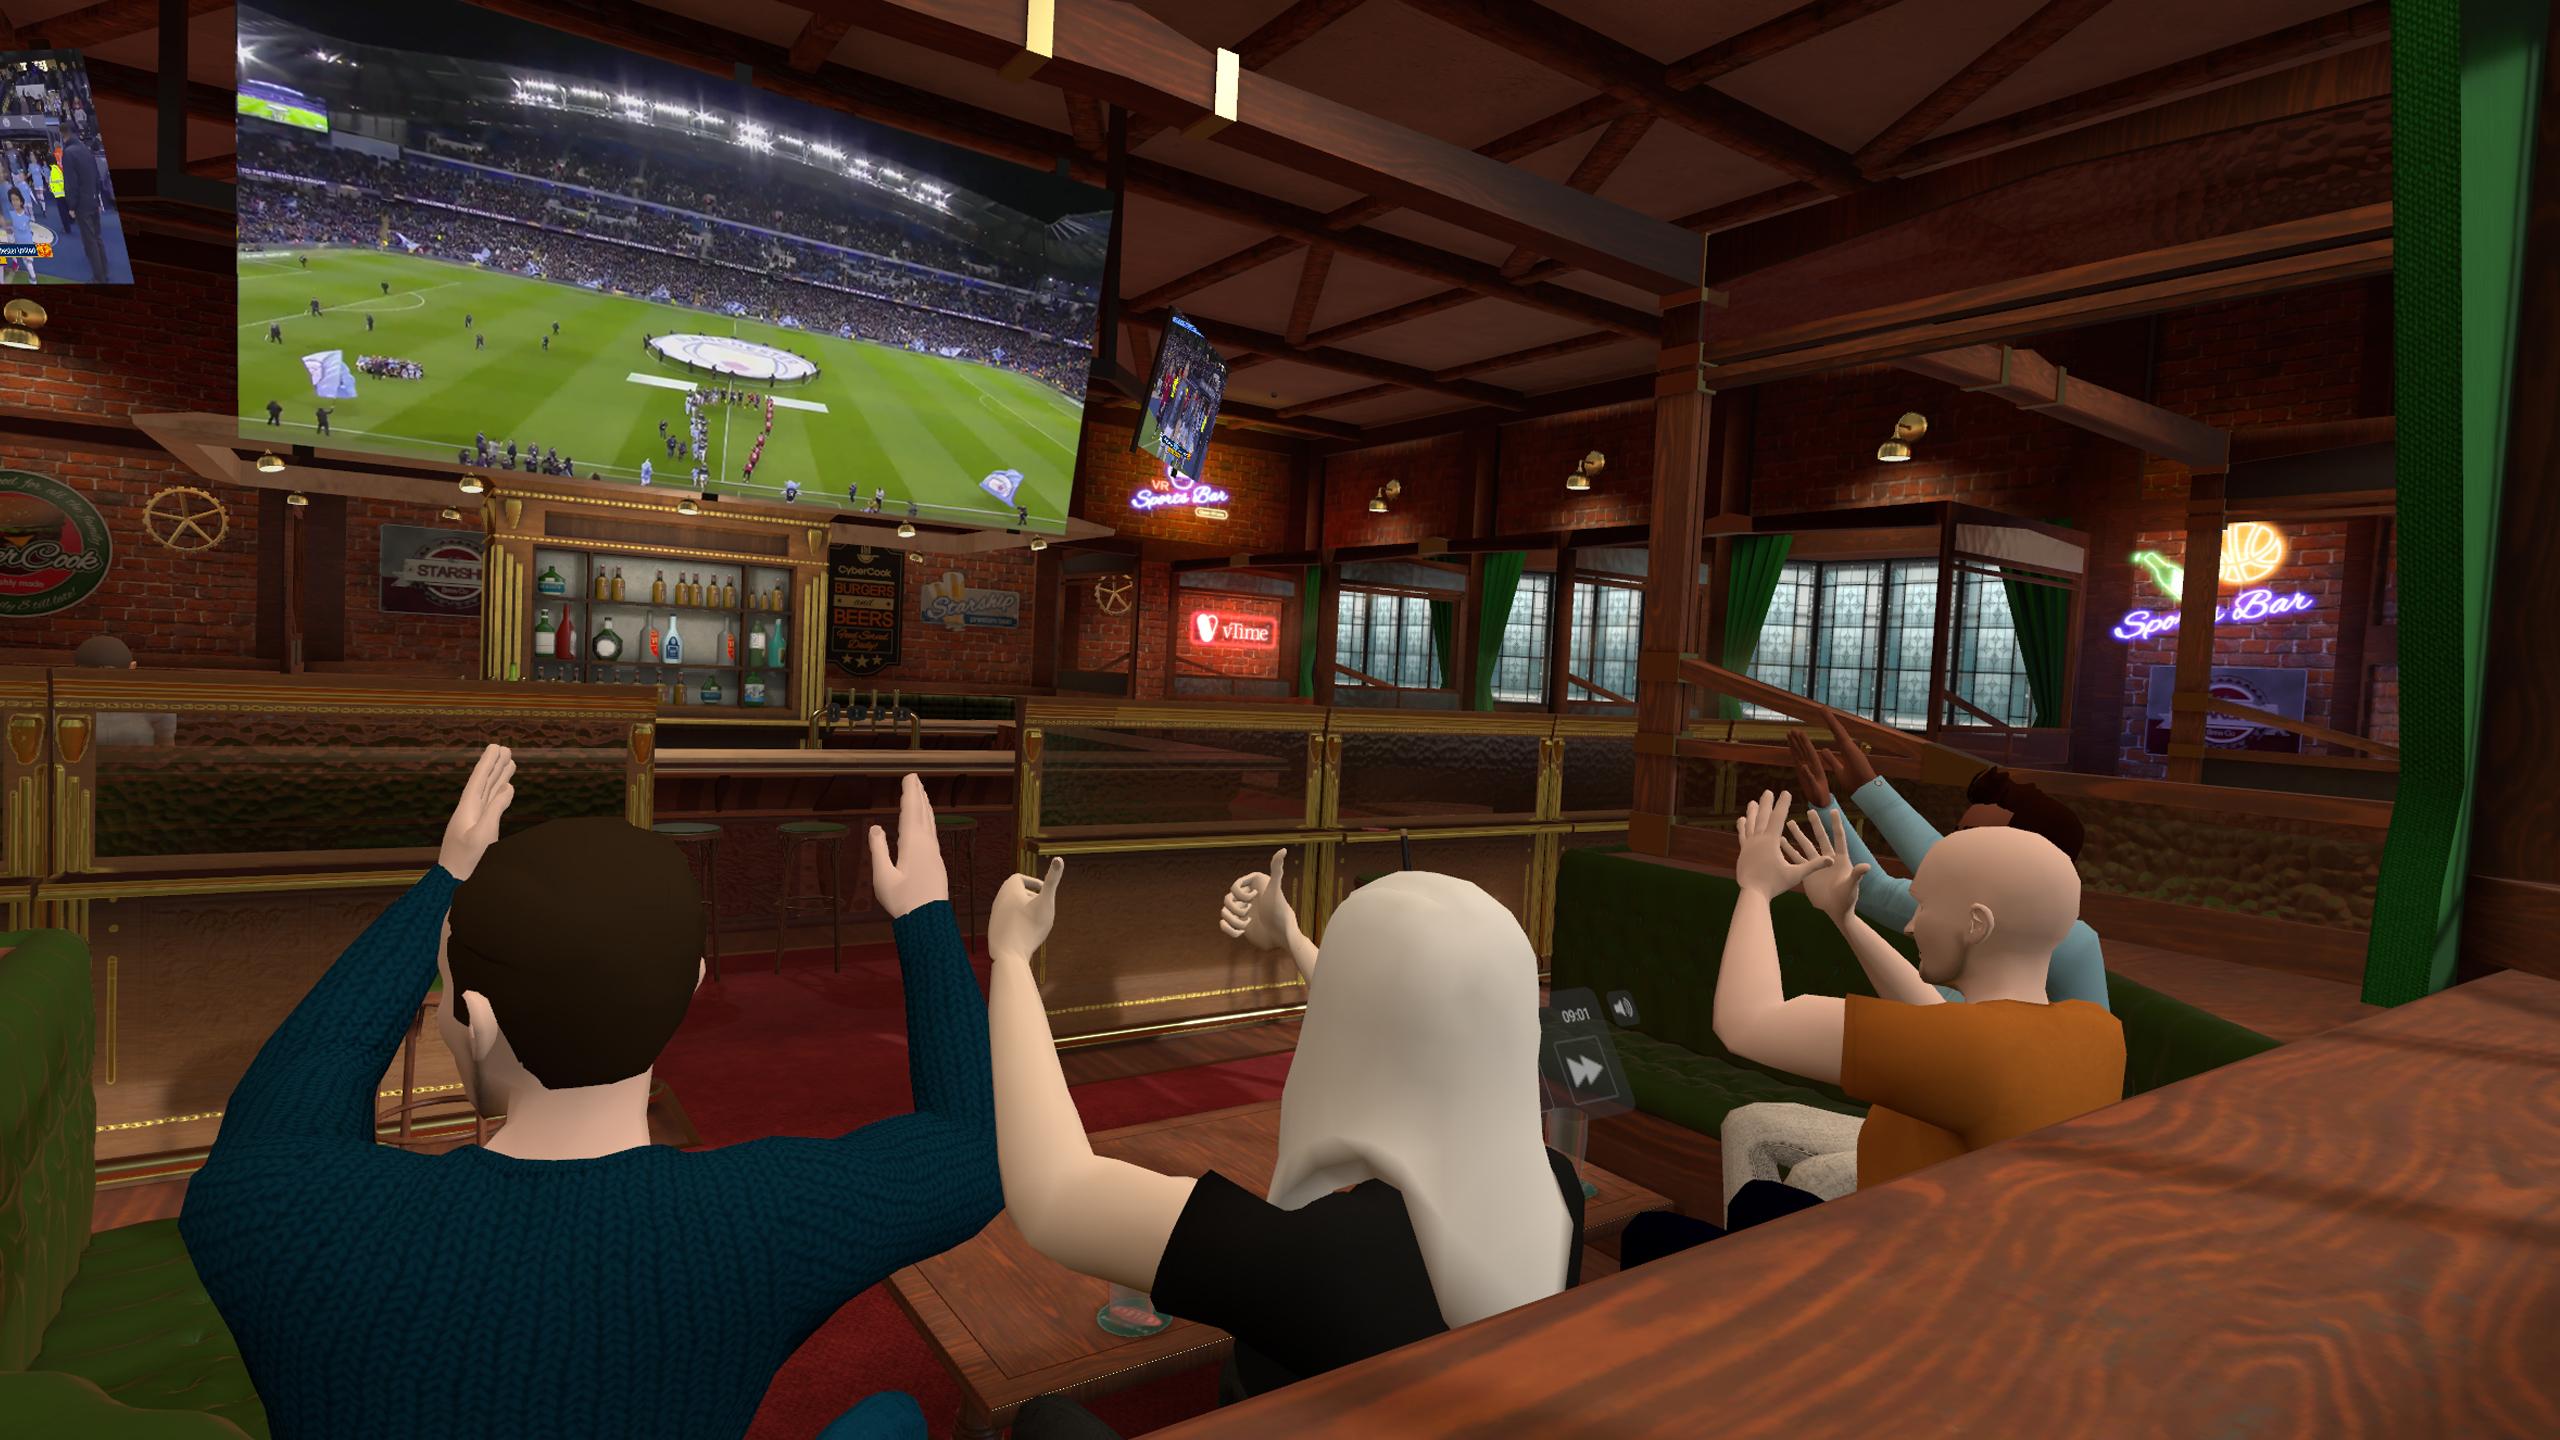 Vtime Xr Sports Bar Theaters